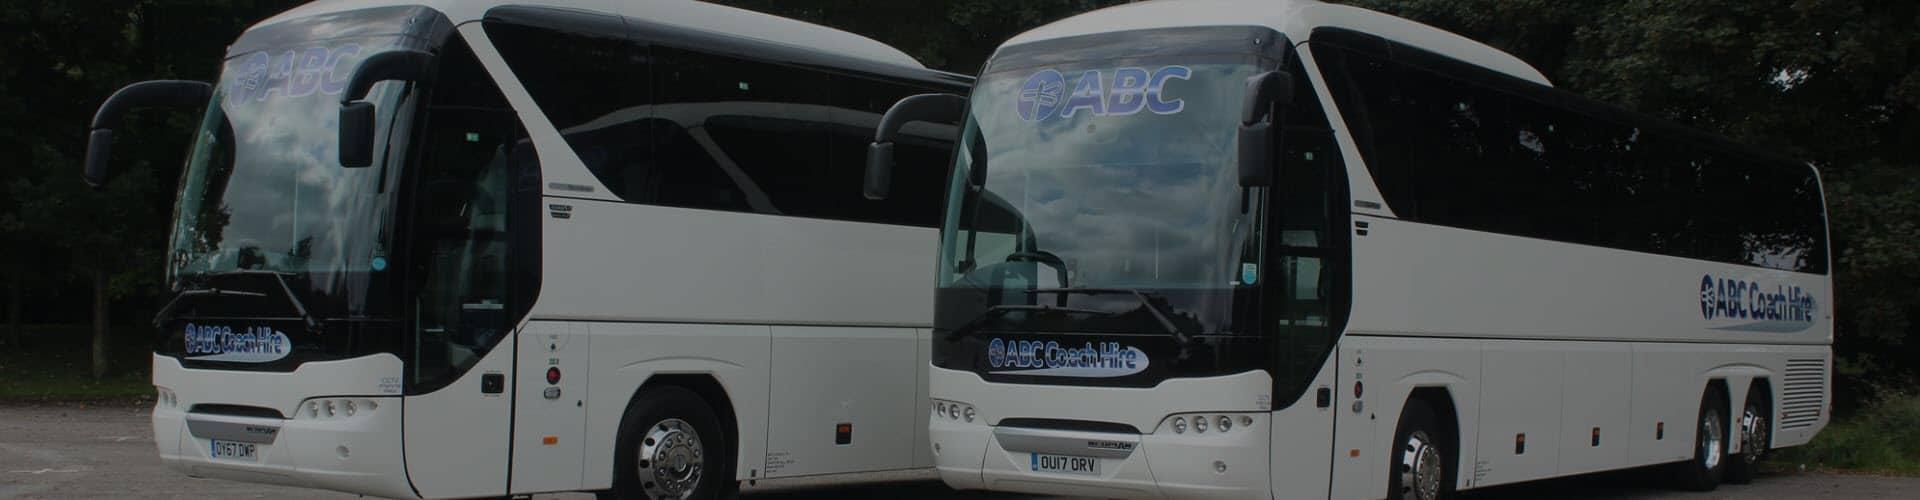 Corporate Coach Hire - ABC Coaches, Manchester